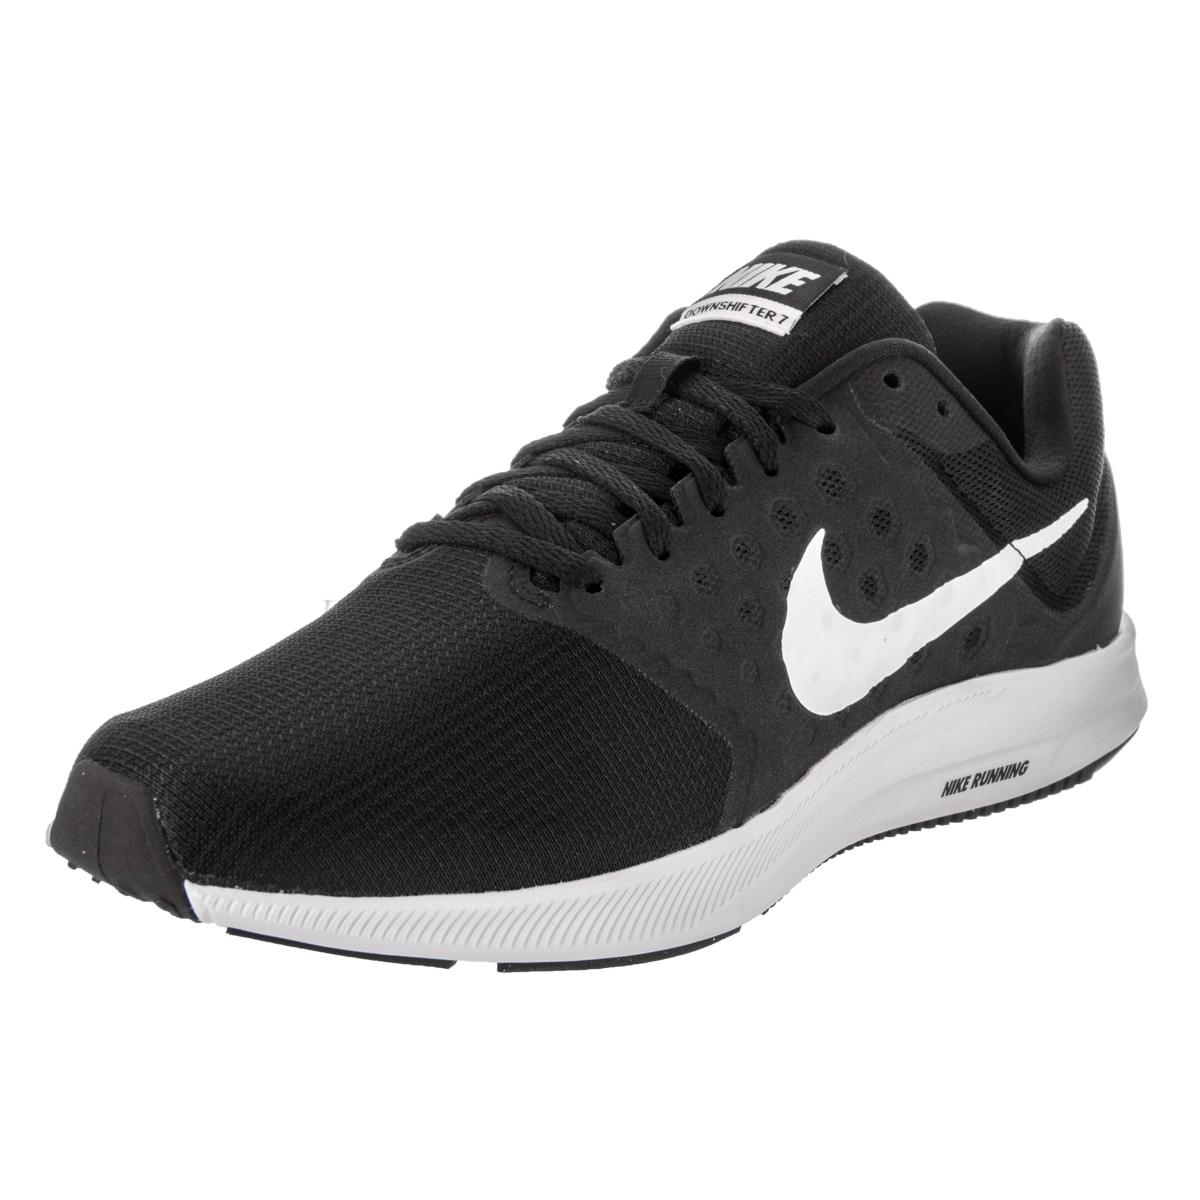 96baf23bb059 Shop Nike Men s Downshifter 7 Black Running Shoes - Free Shipping ...